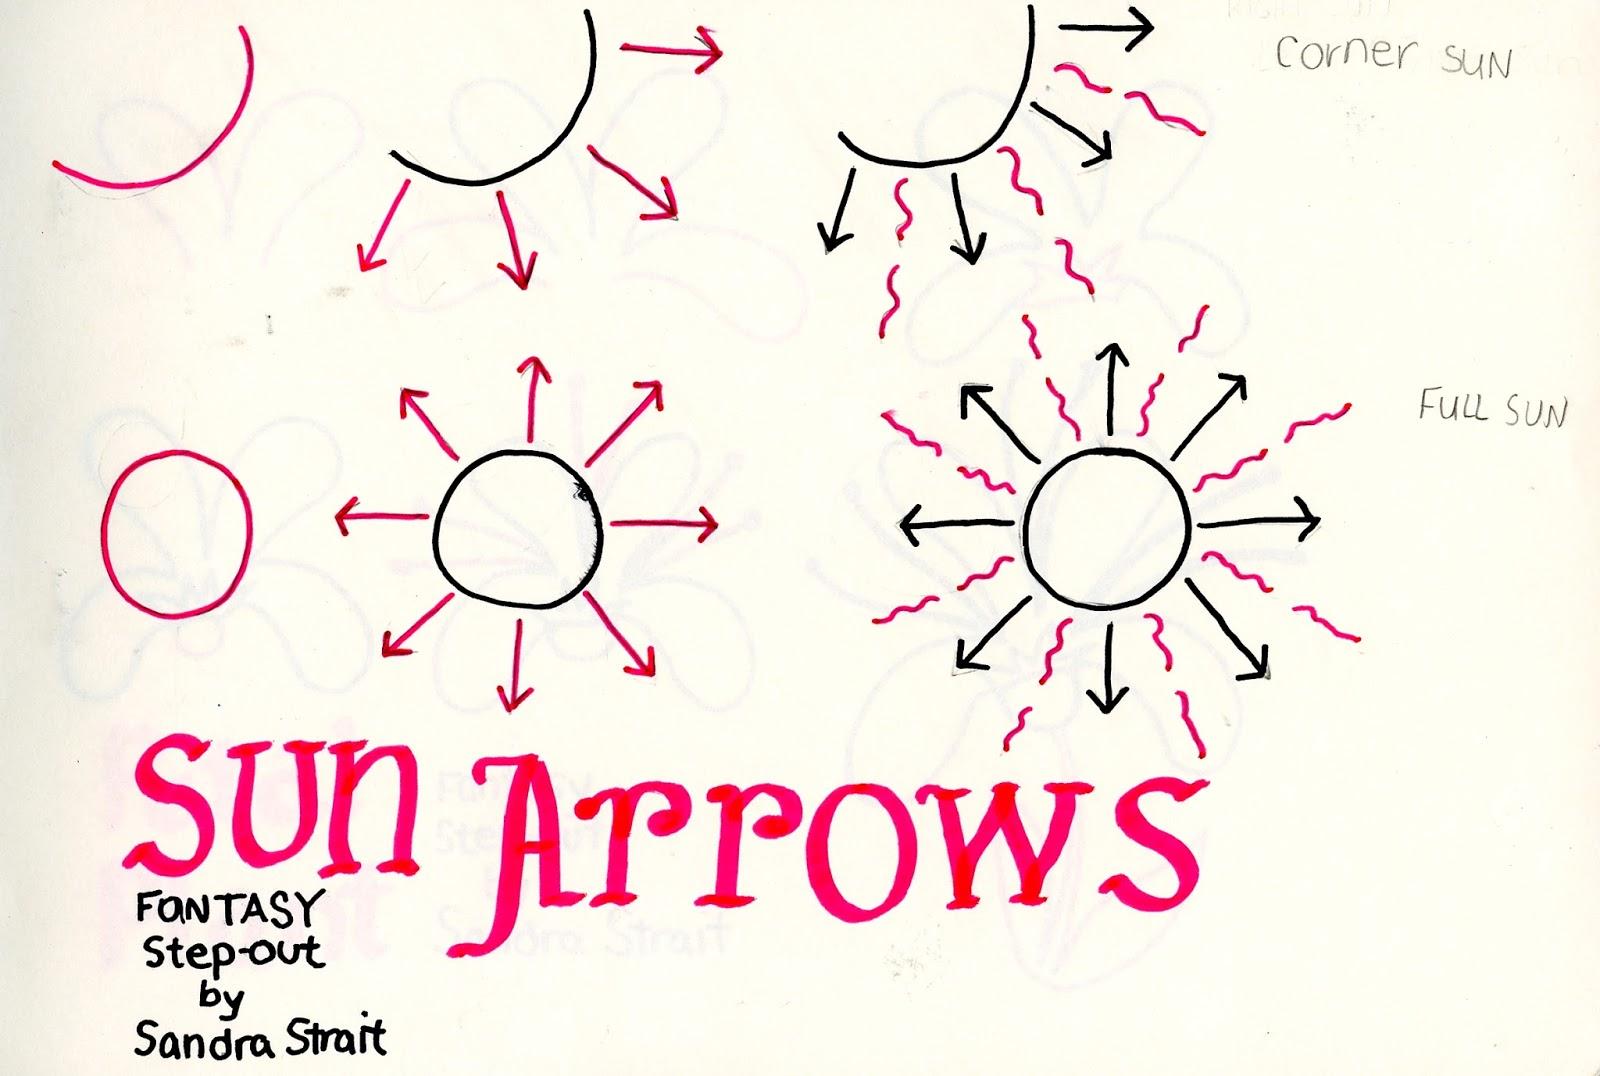 Sun Arrows Fantasy Step Out Fantasylandscape Step Out